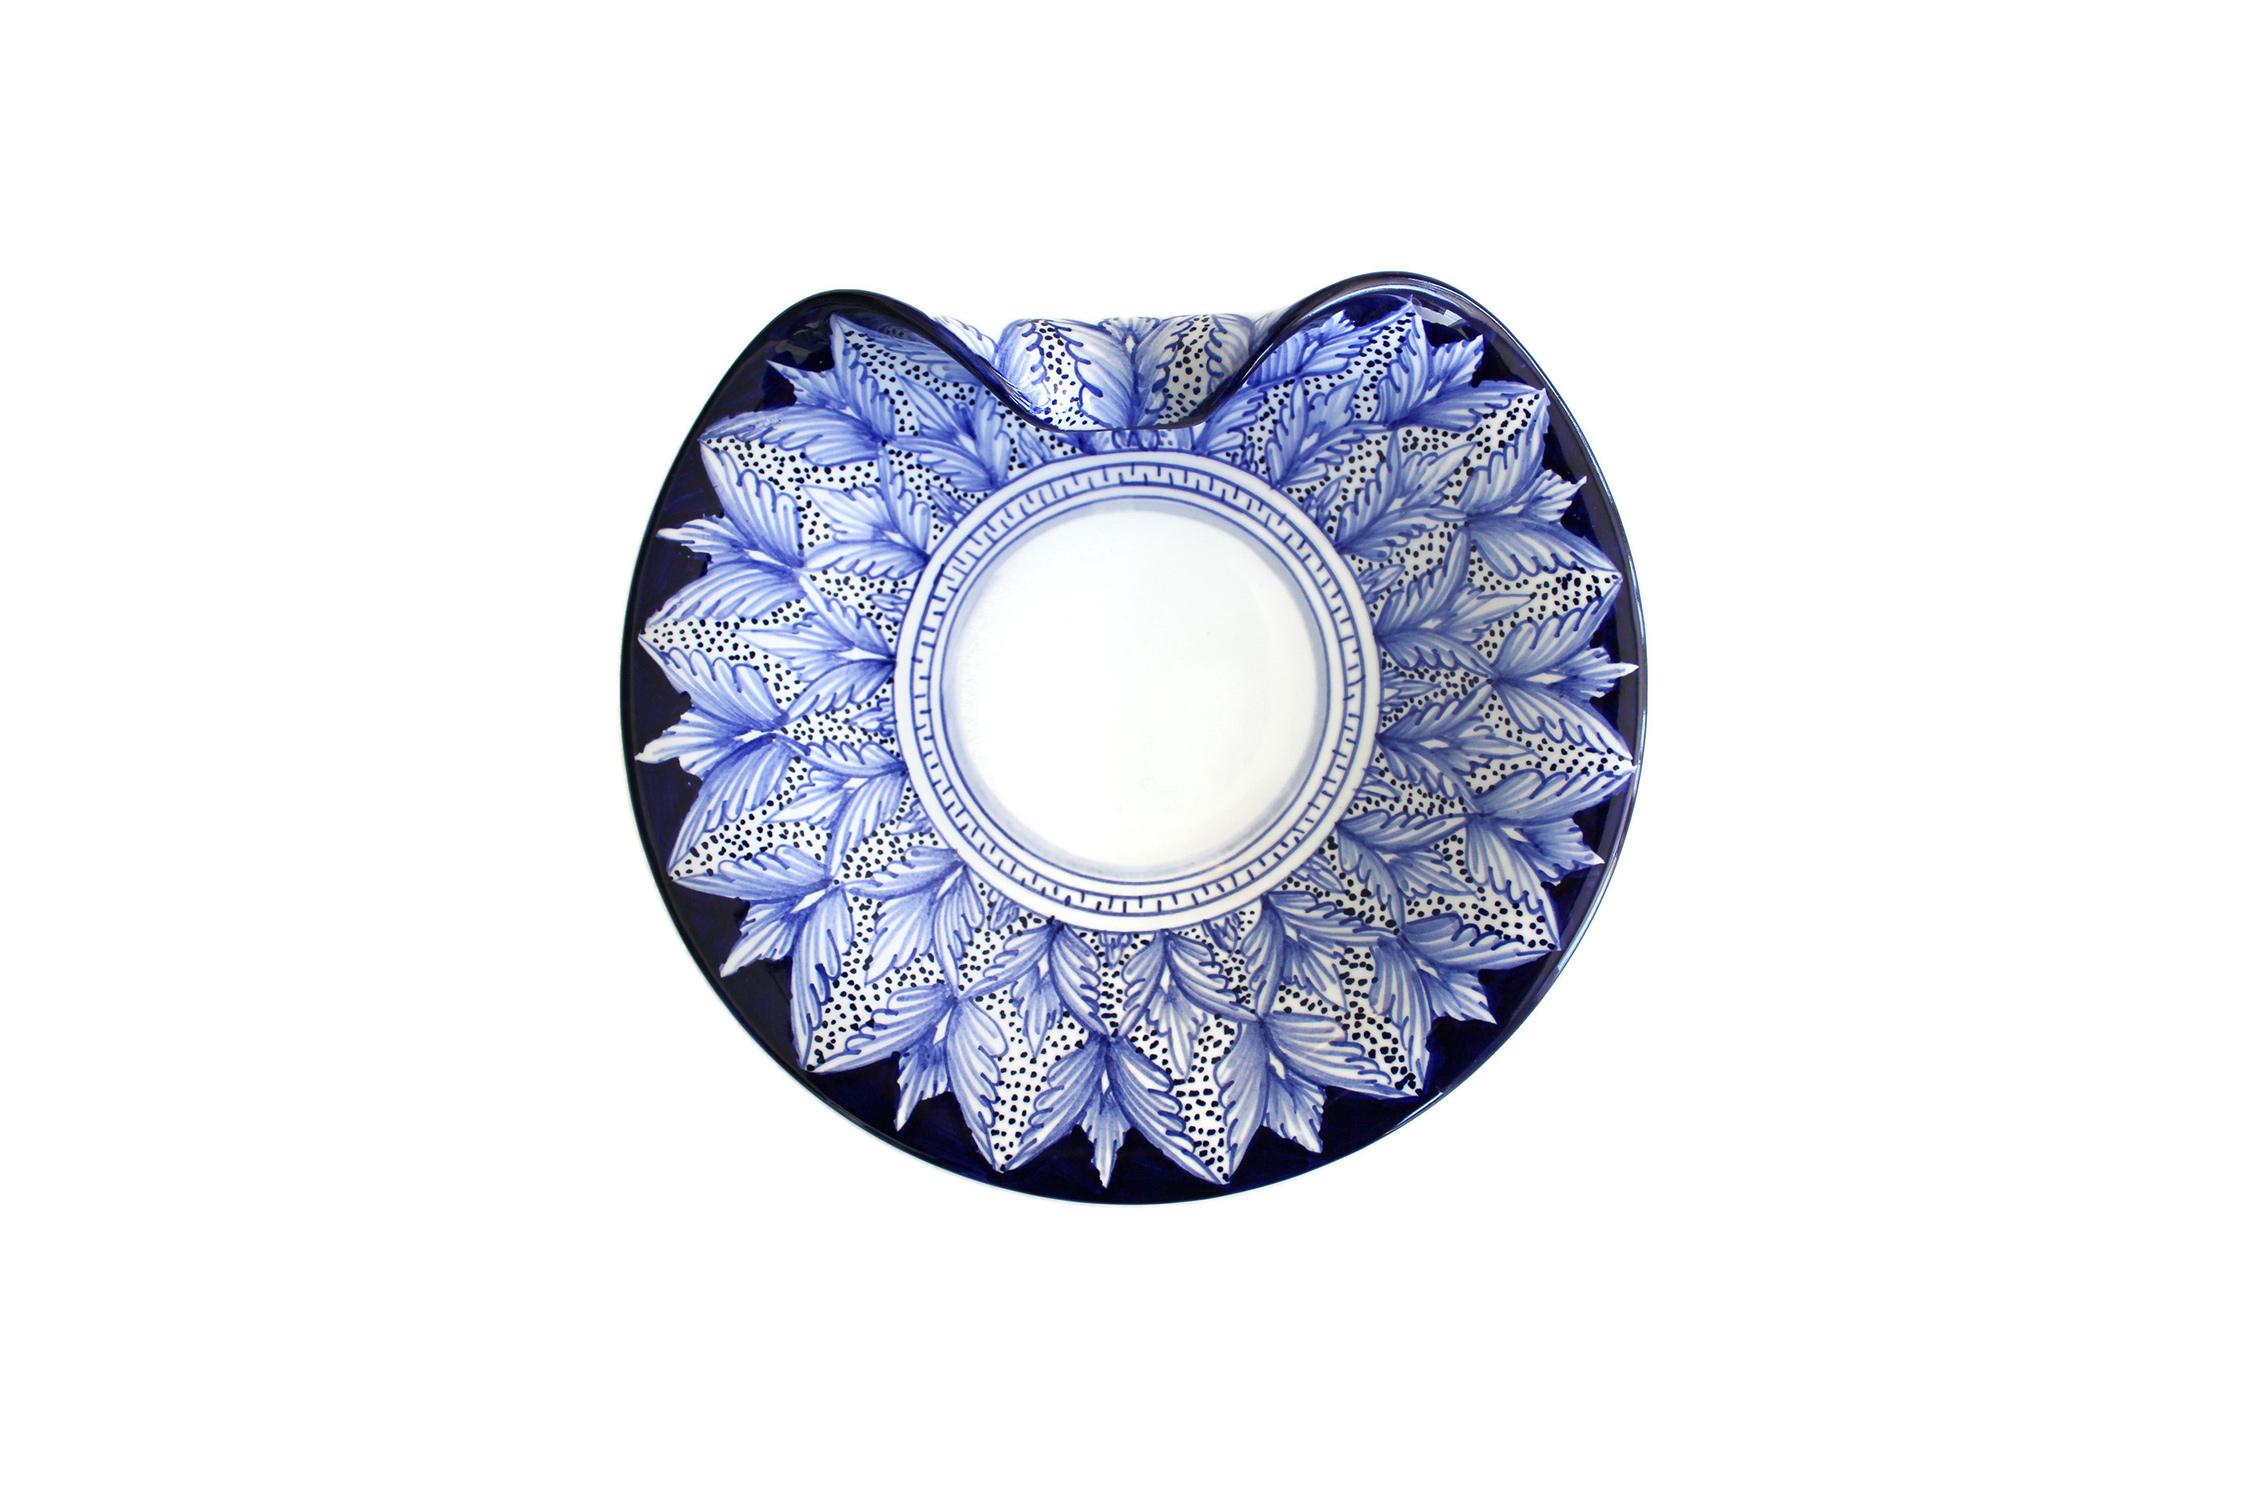 Blu Pavone Art Collection Aperitivo Plate